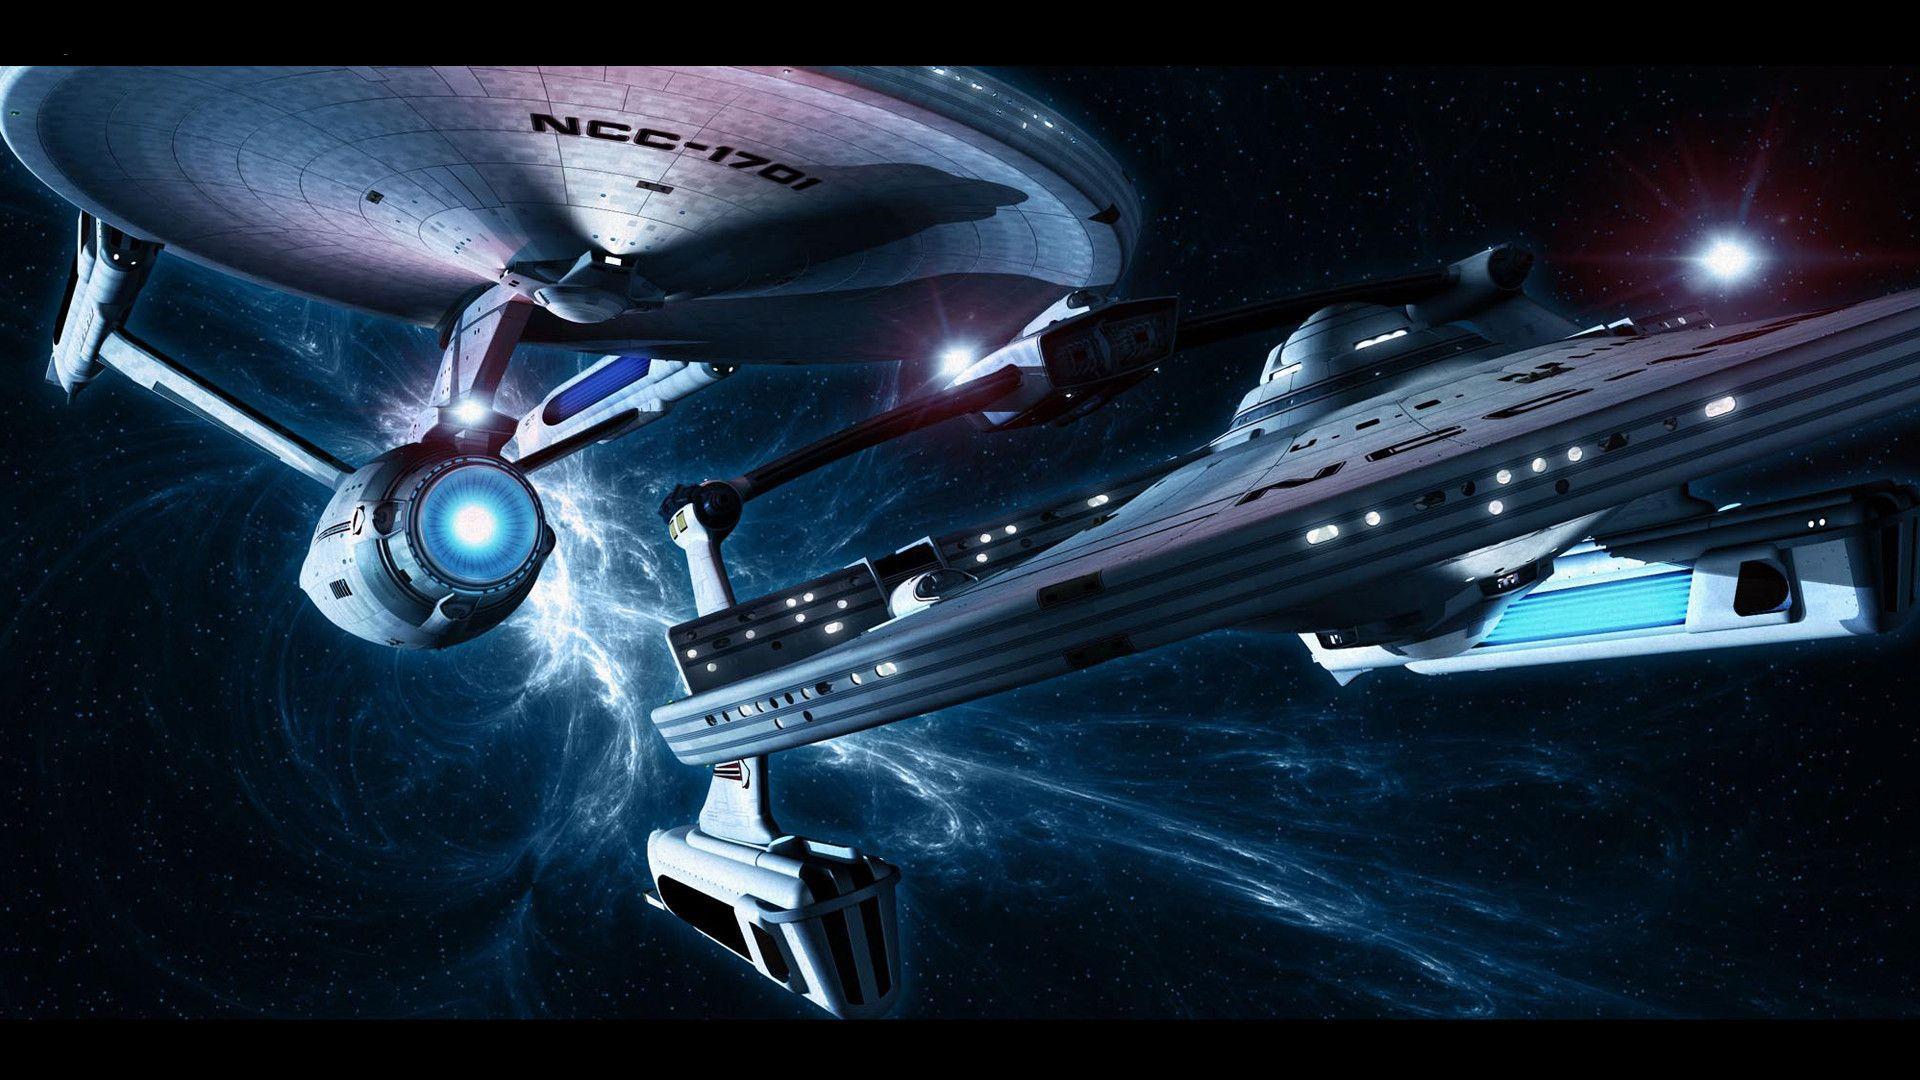 Star Trek Wallpapers HD - Wallpaper Cave